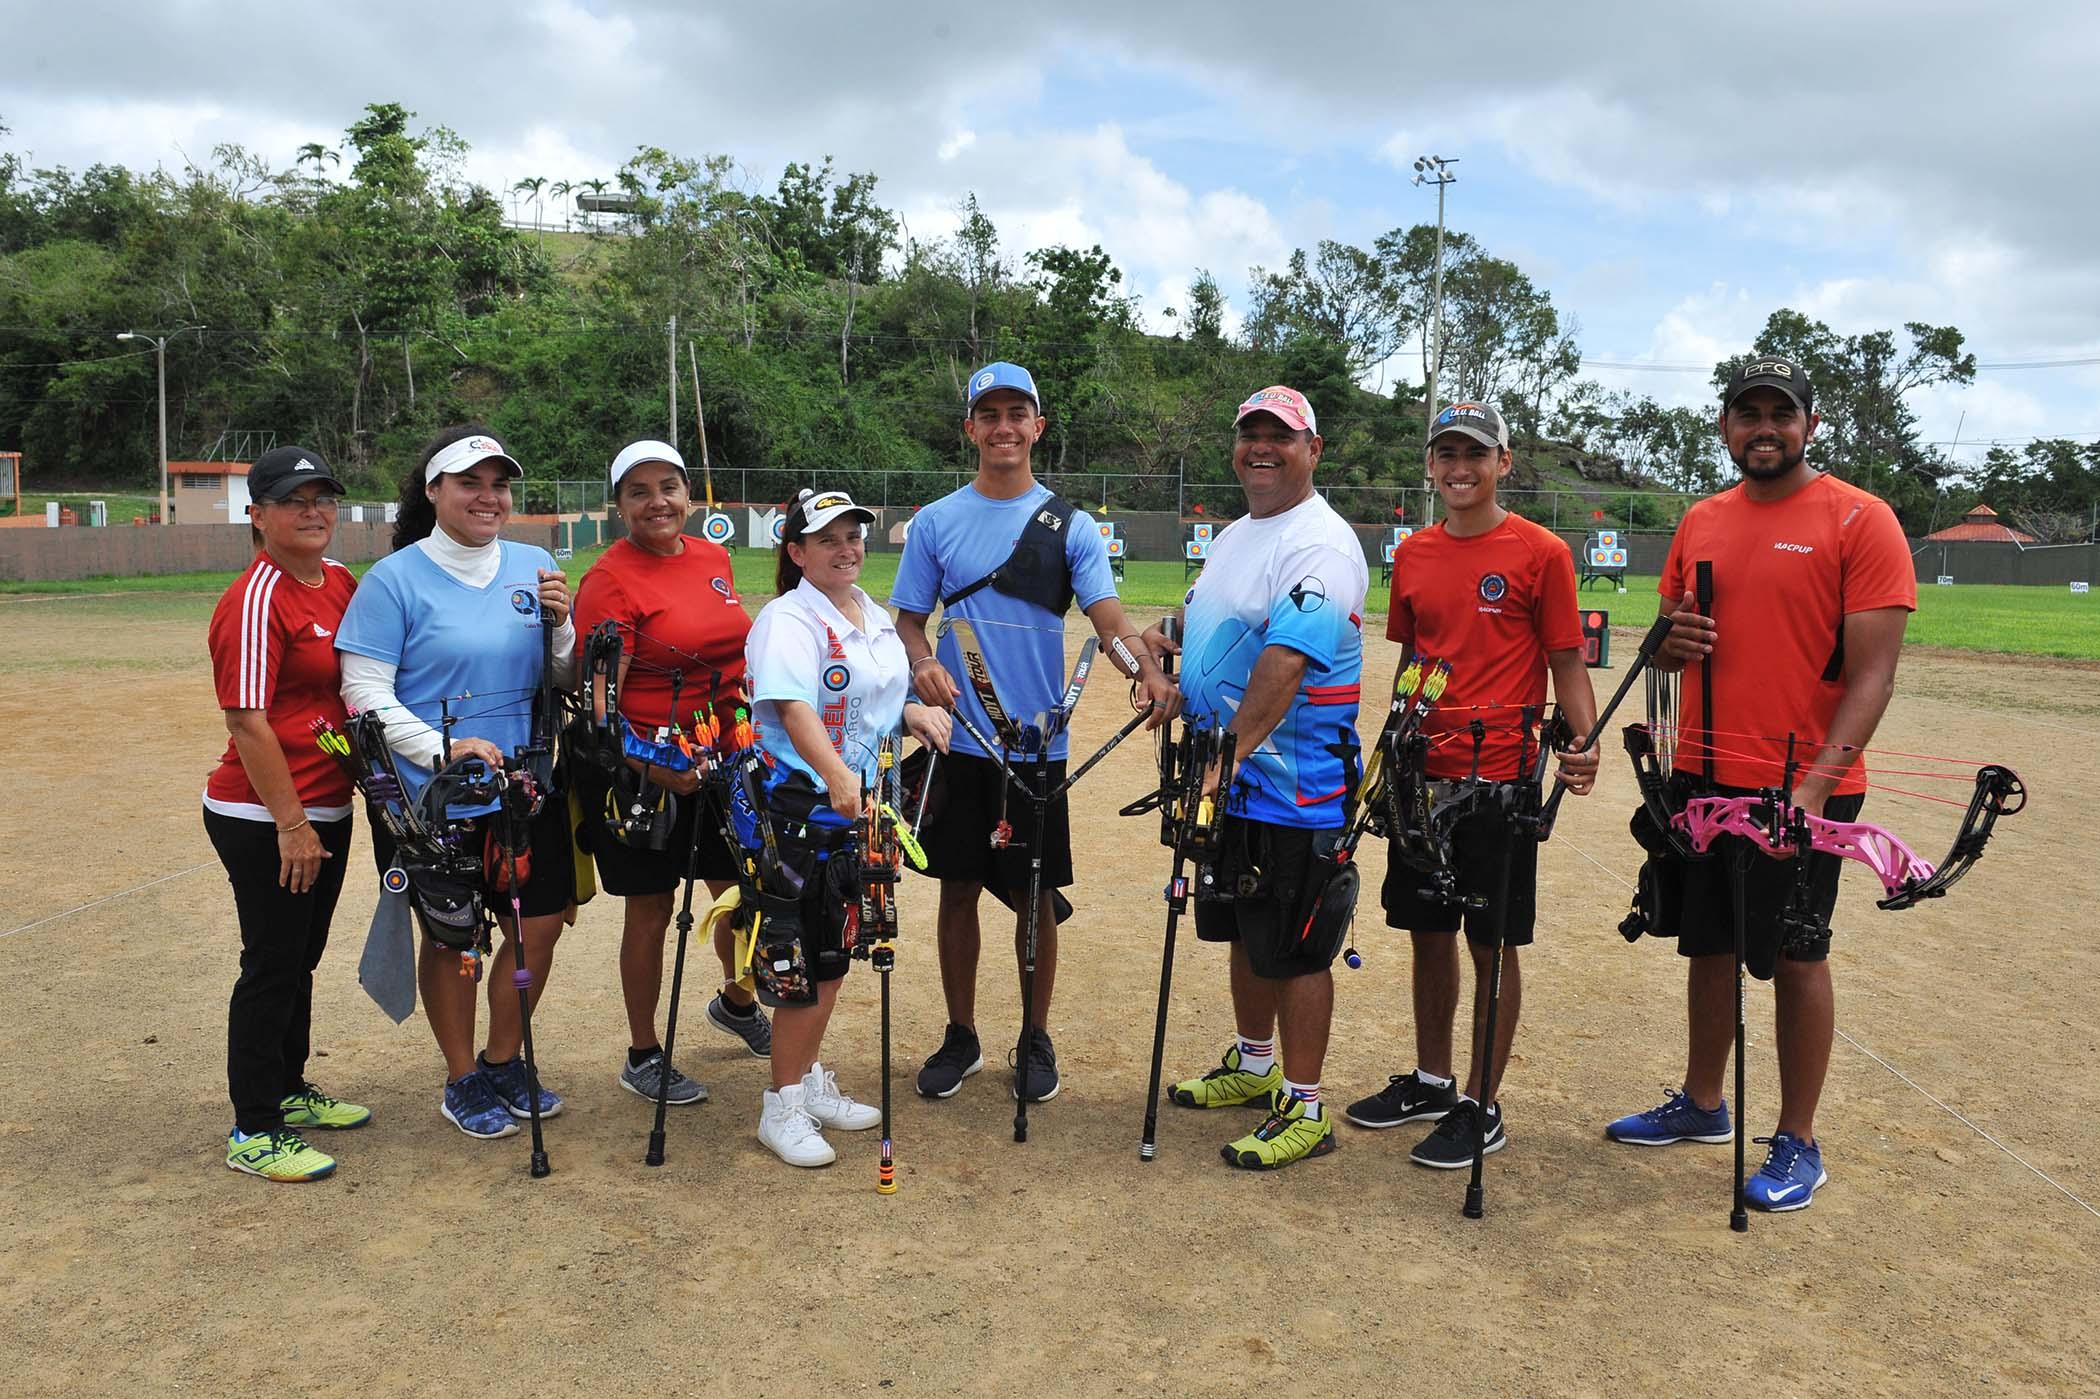 coach Maria Reyes-Marla Cintron-Maria Latorre-Nereida Velez-Adrian Munoz-Jose Reyes-Brian Alvarado-Jan Pizarro-1.jpg